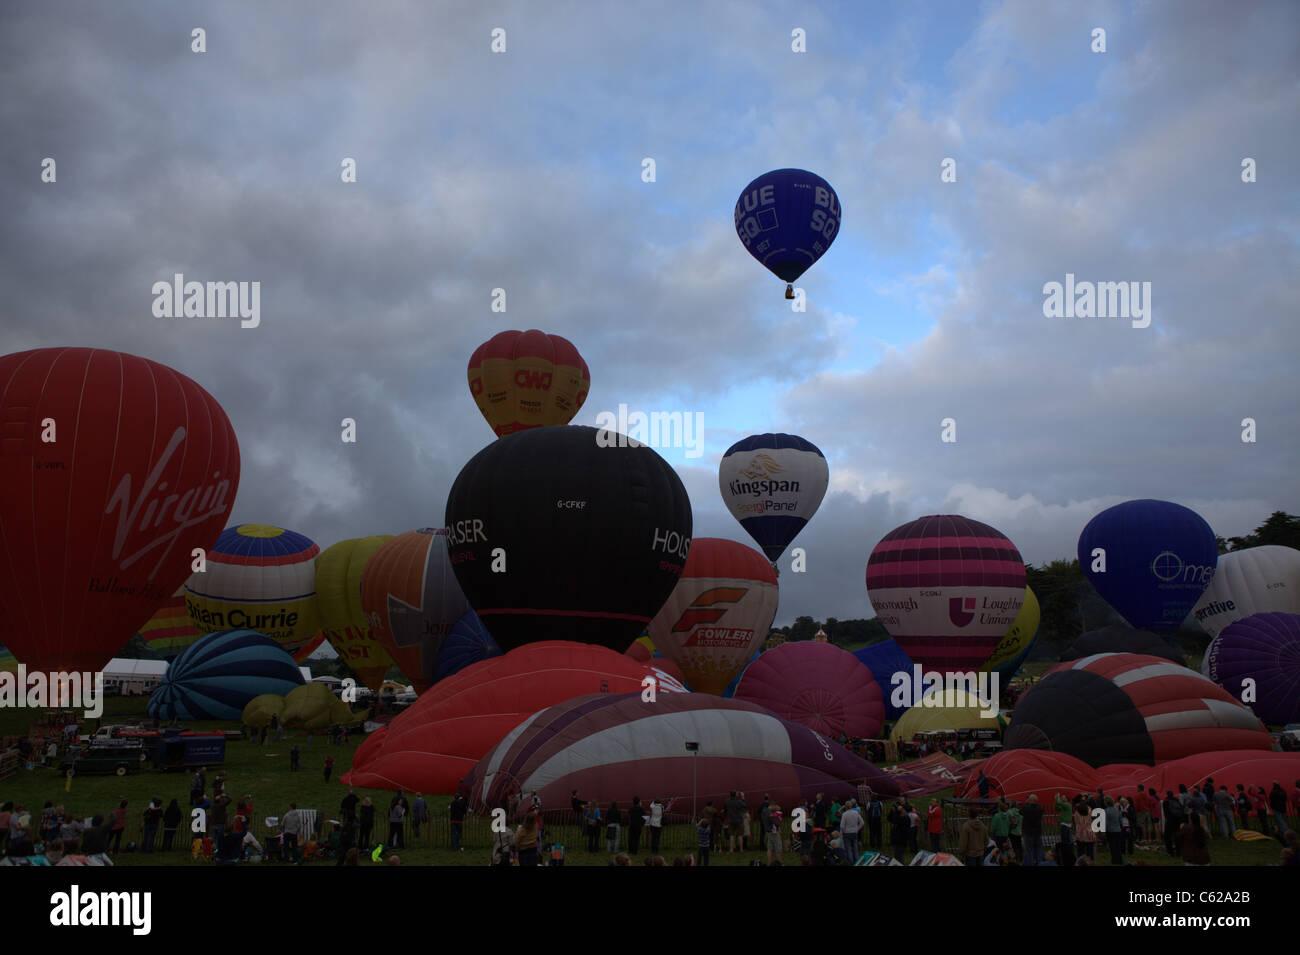 Bristol Balloon Fiesta, Dawn mass ascent - Stock Image